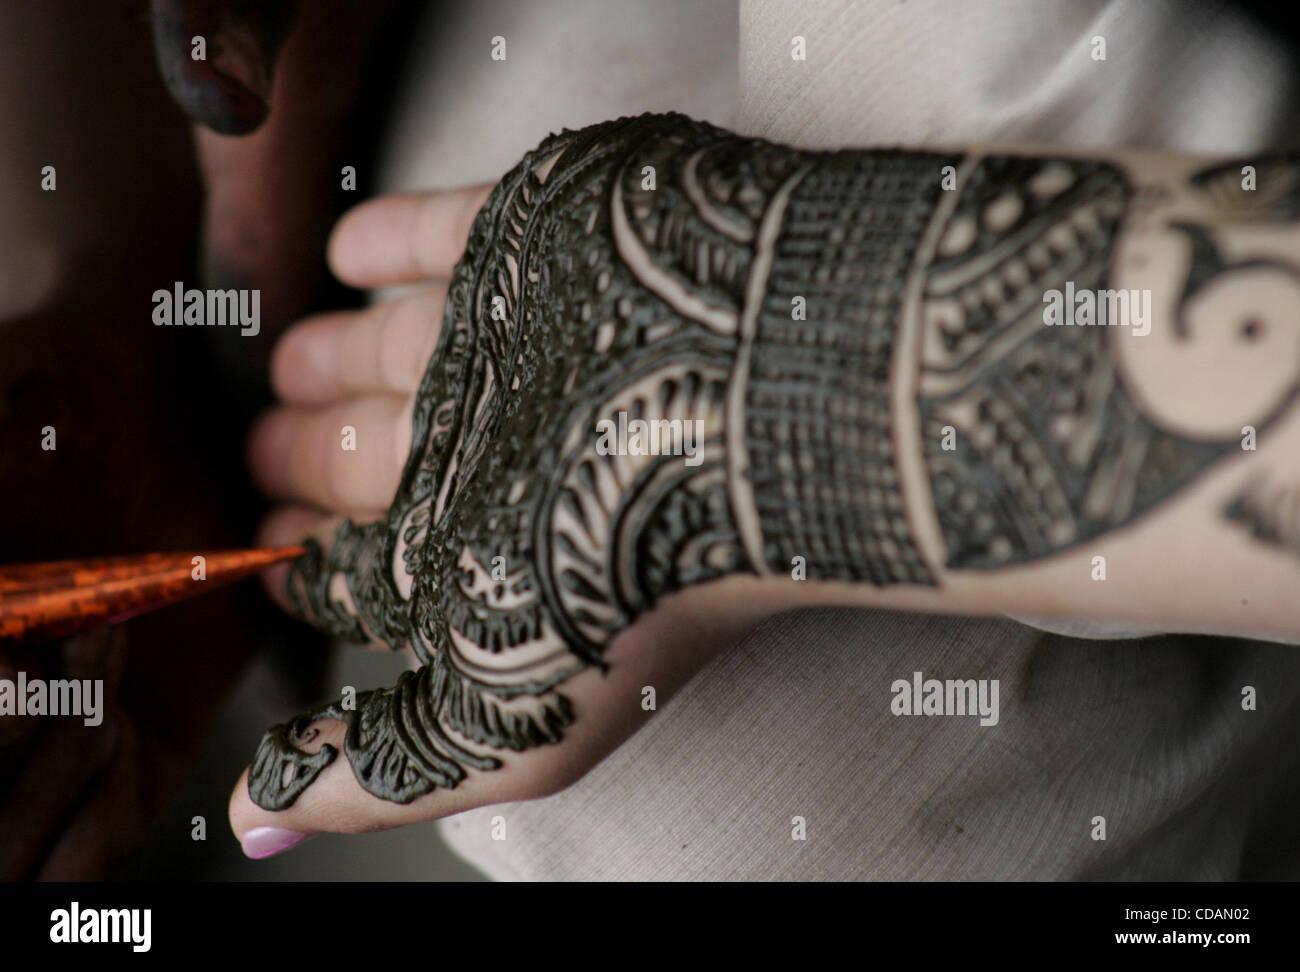 Download Hajj Eid Al-Fitr Decorations - a-kashmiri-muslim-gets-her-hand-decorated-with-henna-ahead-of-eid-CDAN02  2018_168362 .jpg